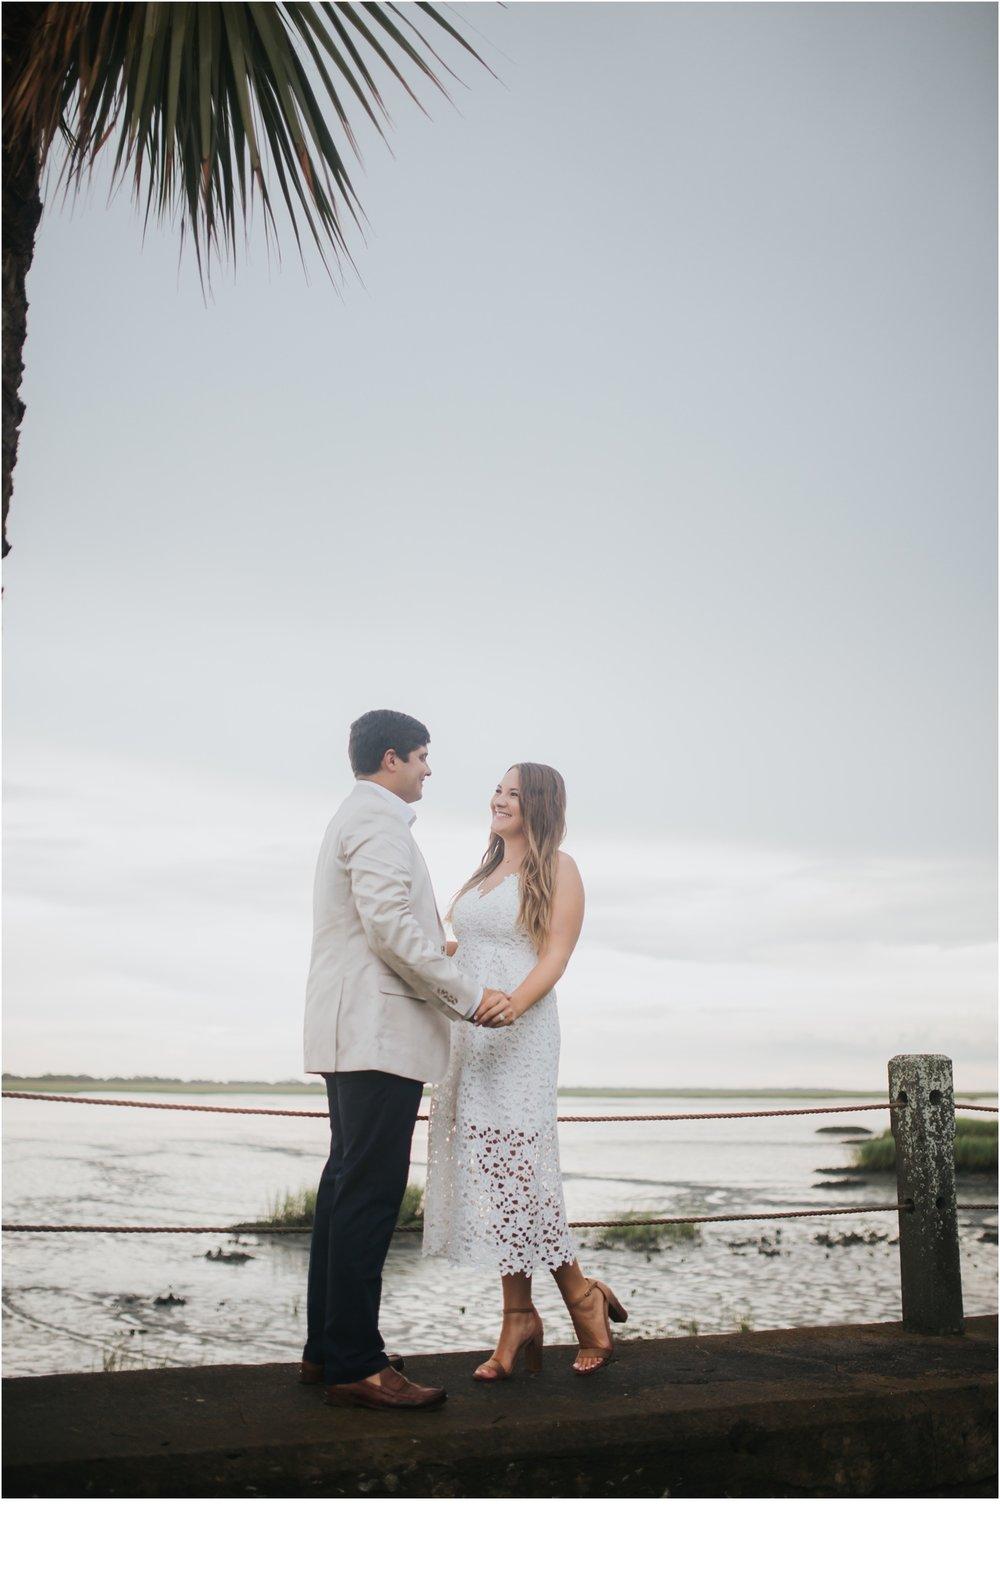 Rainey_Gregg_Photography_St._Simons_Island_Georgia_California_Wedding_Portrait_Photography_1134.jpg